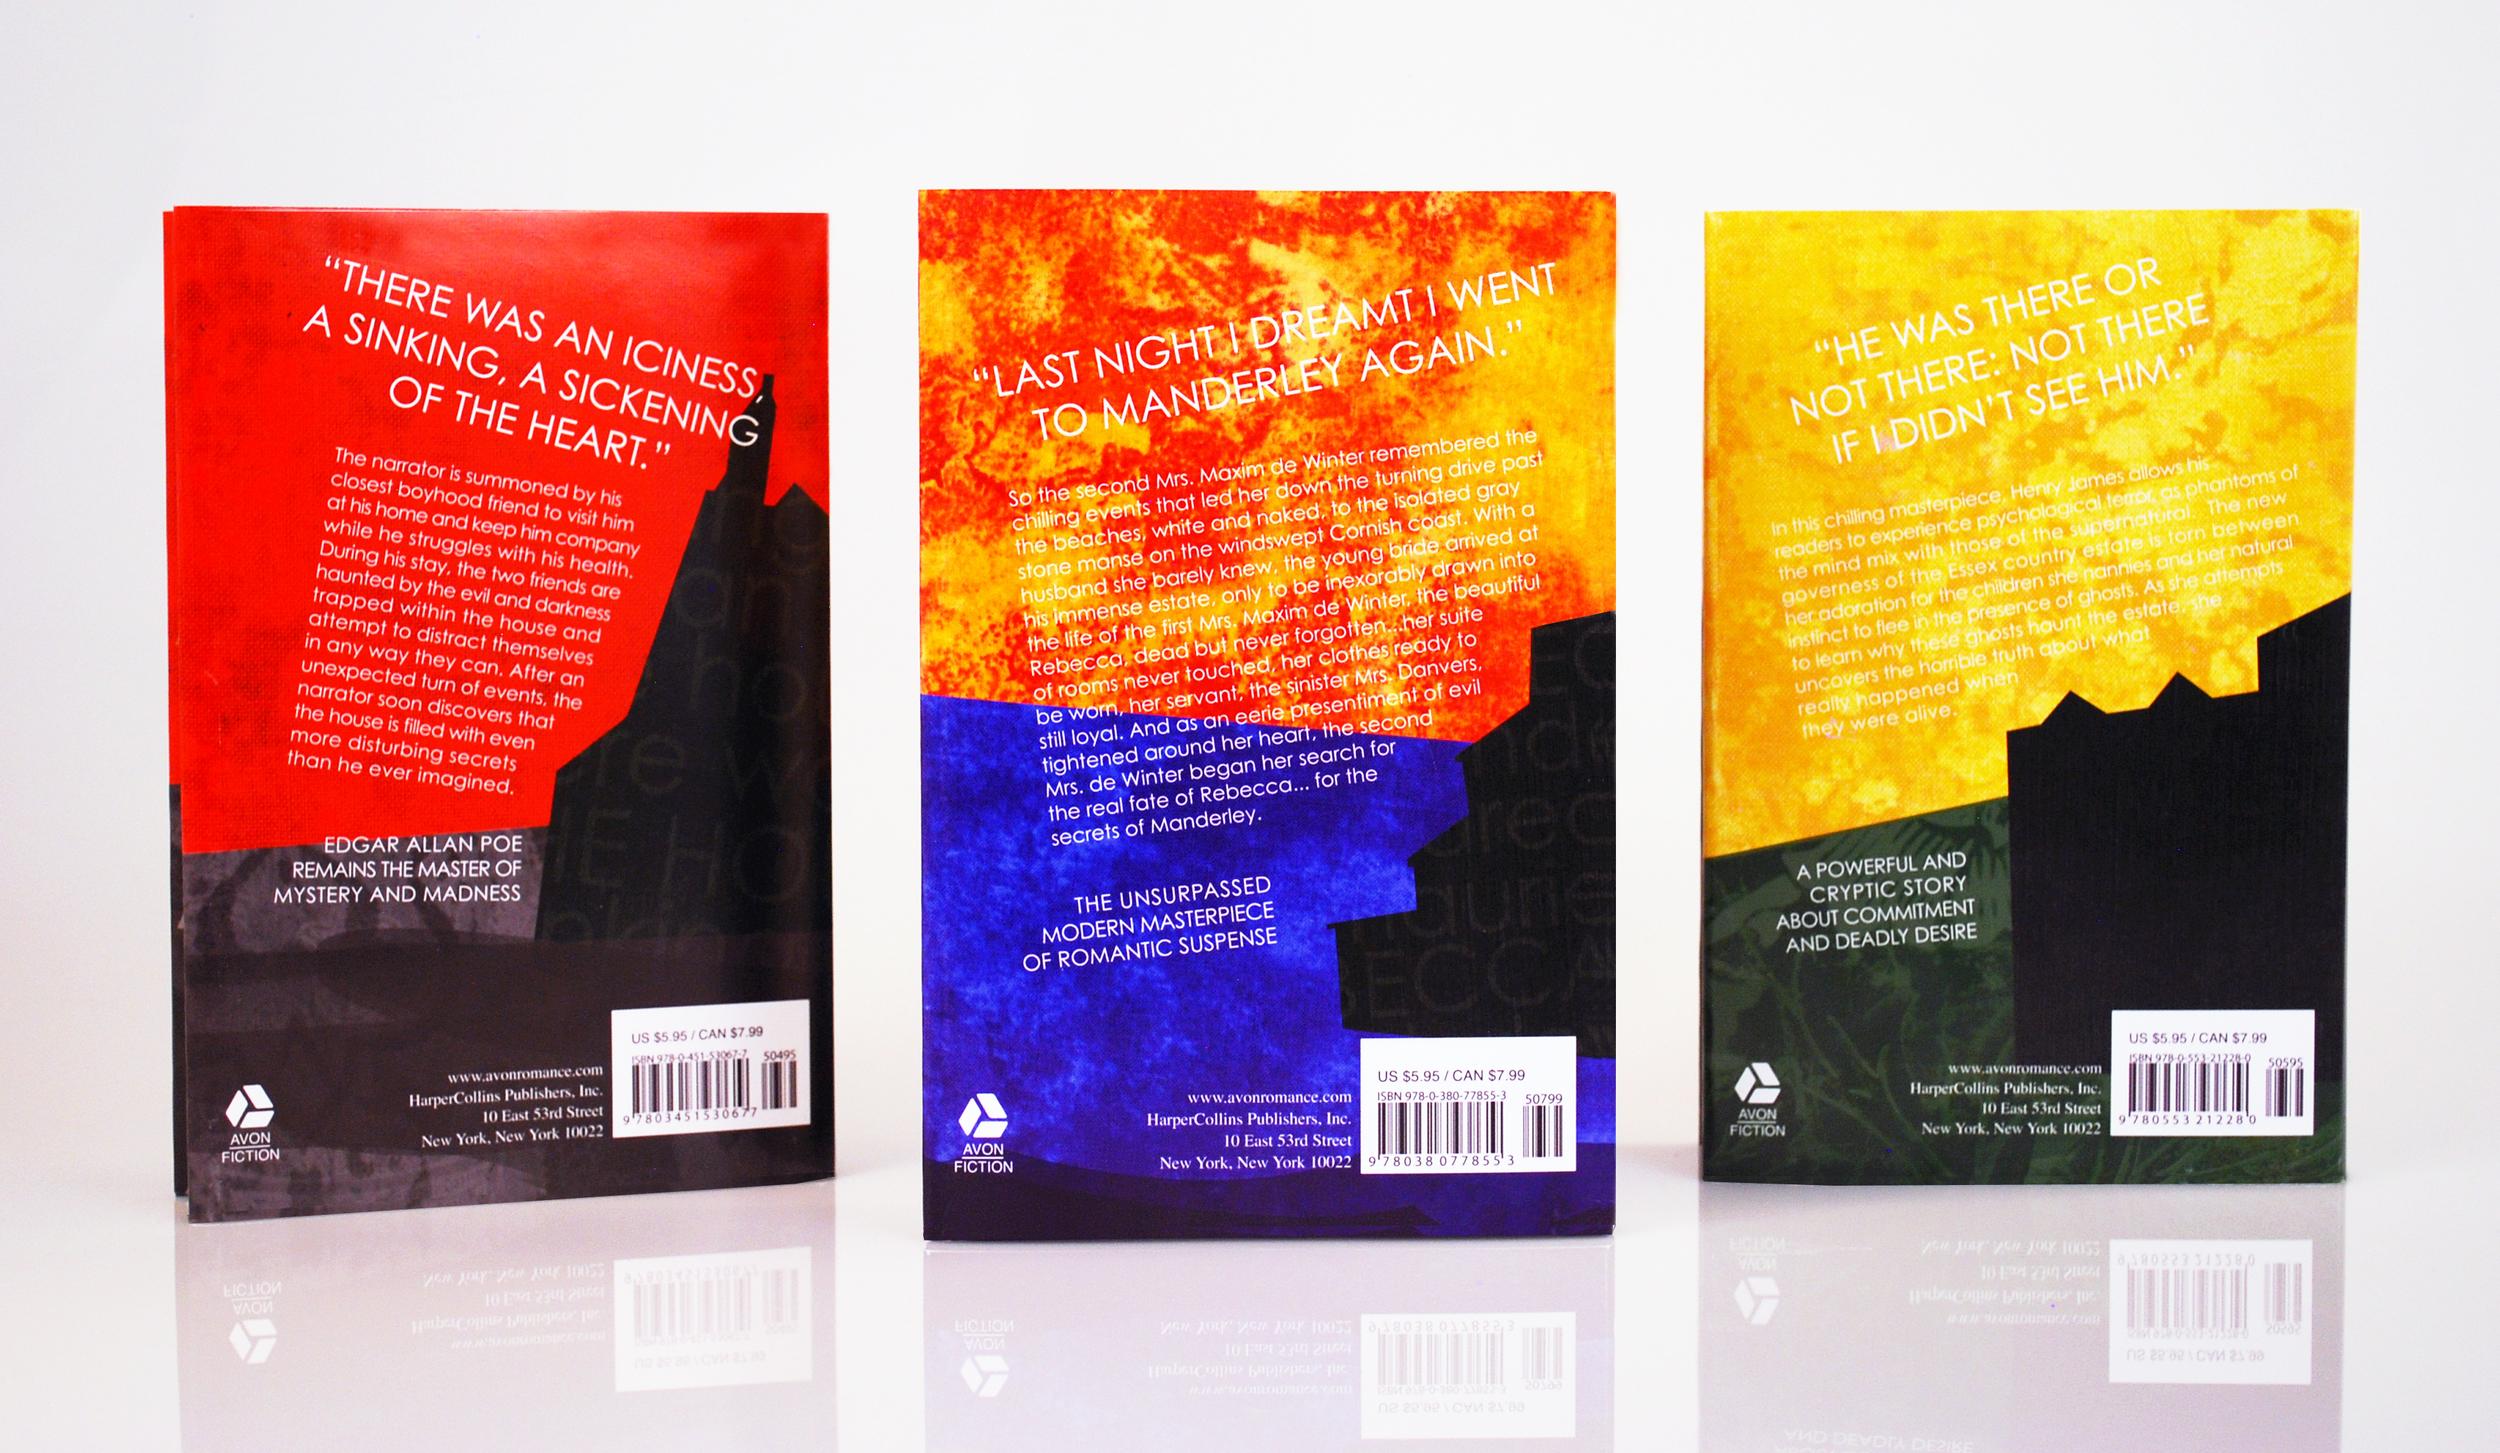 book cover backs cropped.jpg